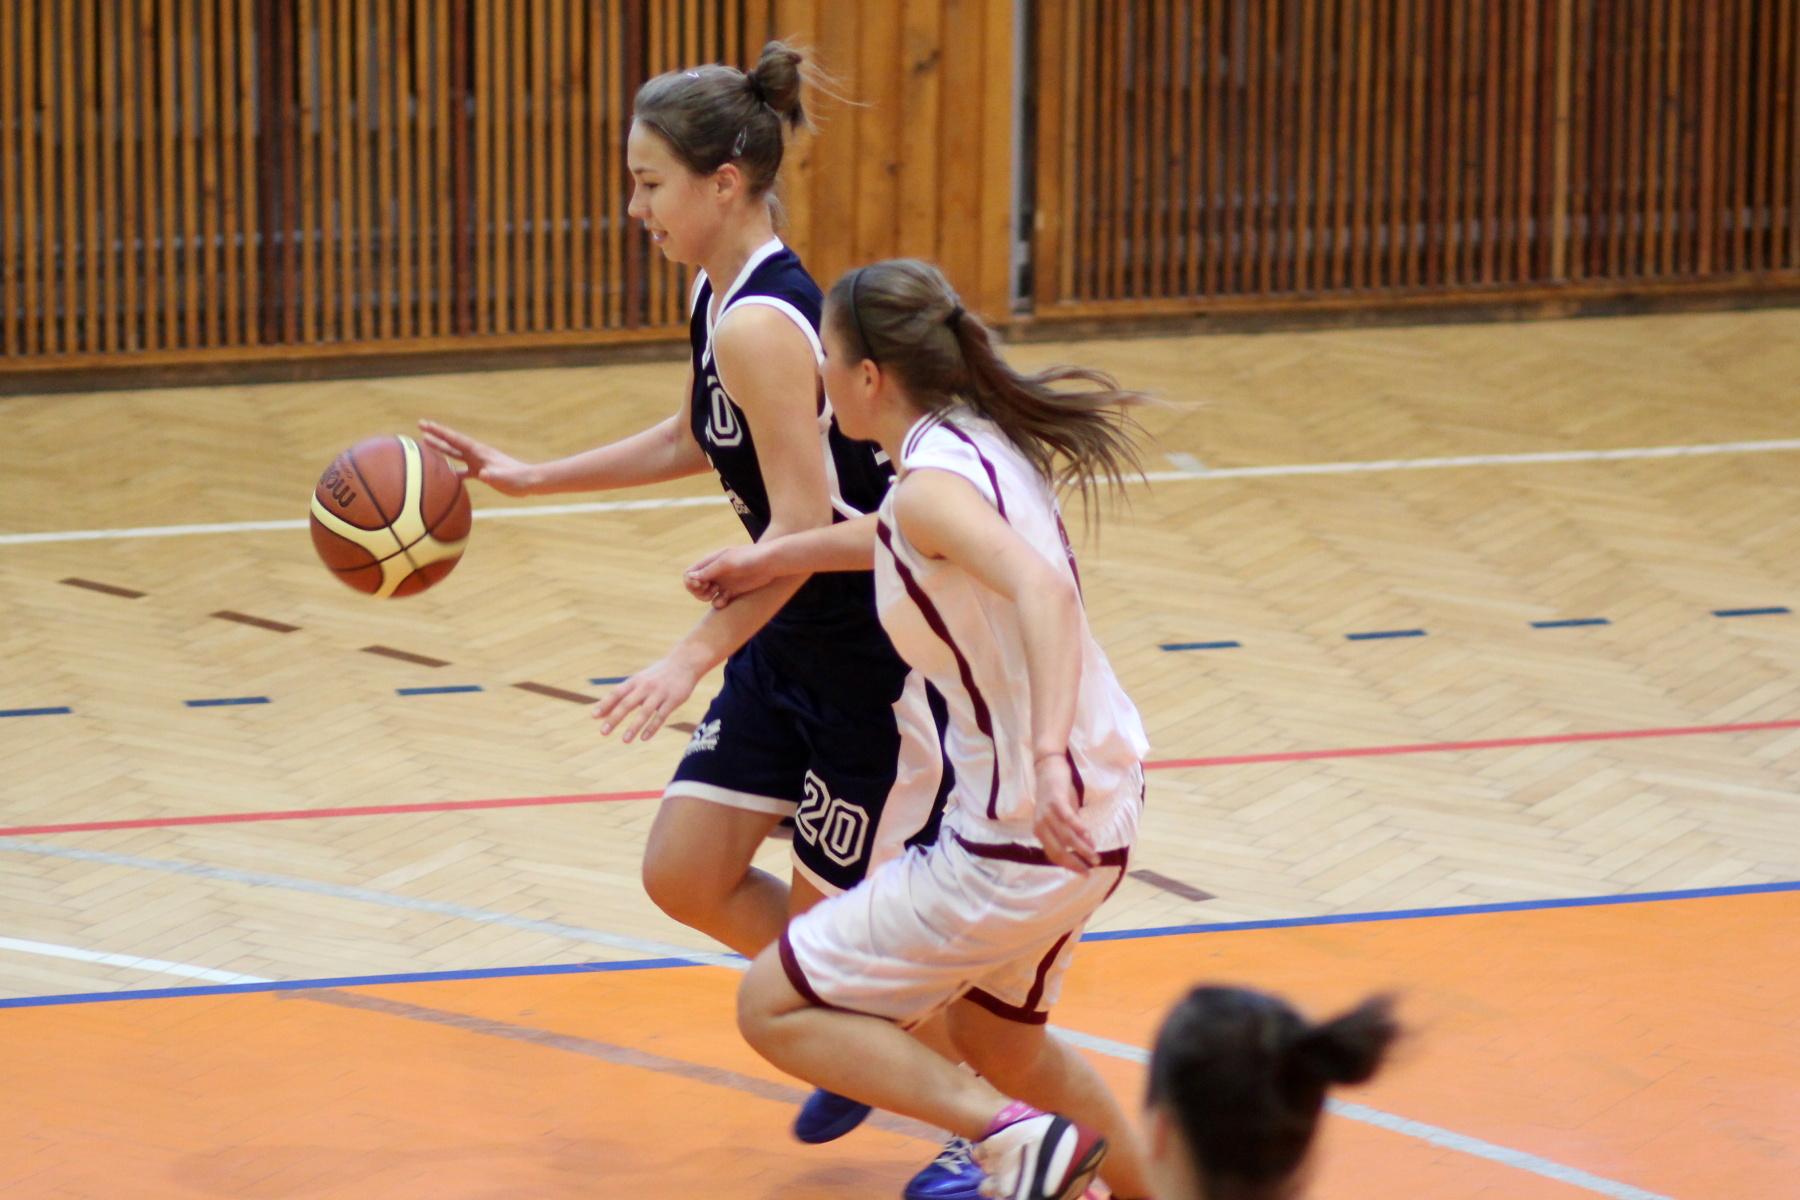 bk-zvolen-bk-petrzalka-ziacky-basketbal-5